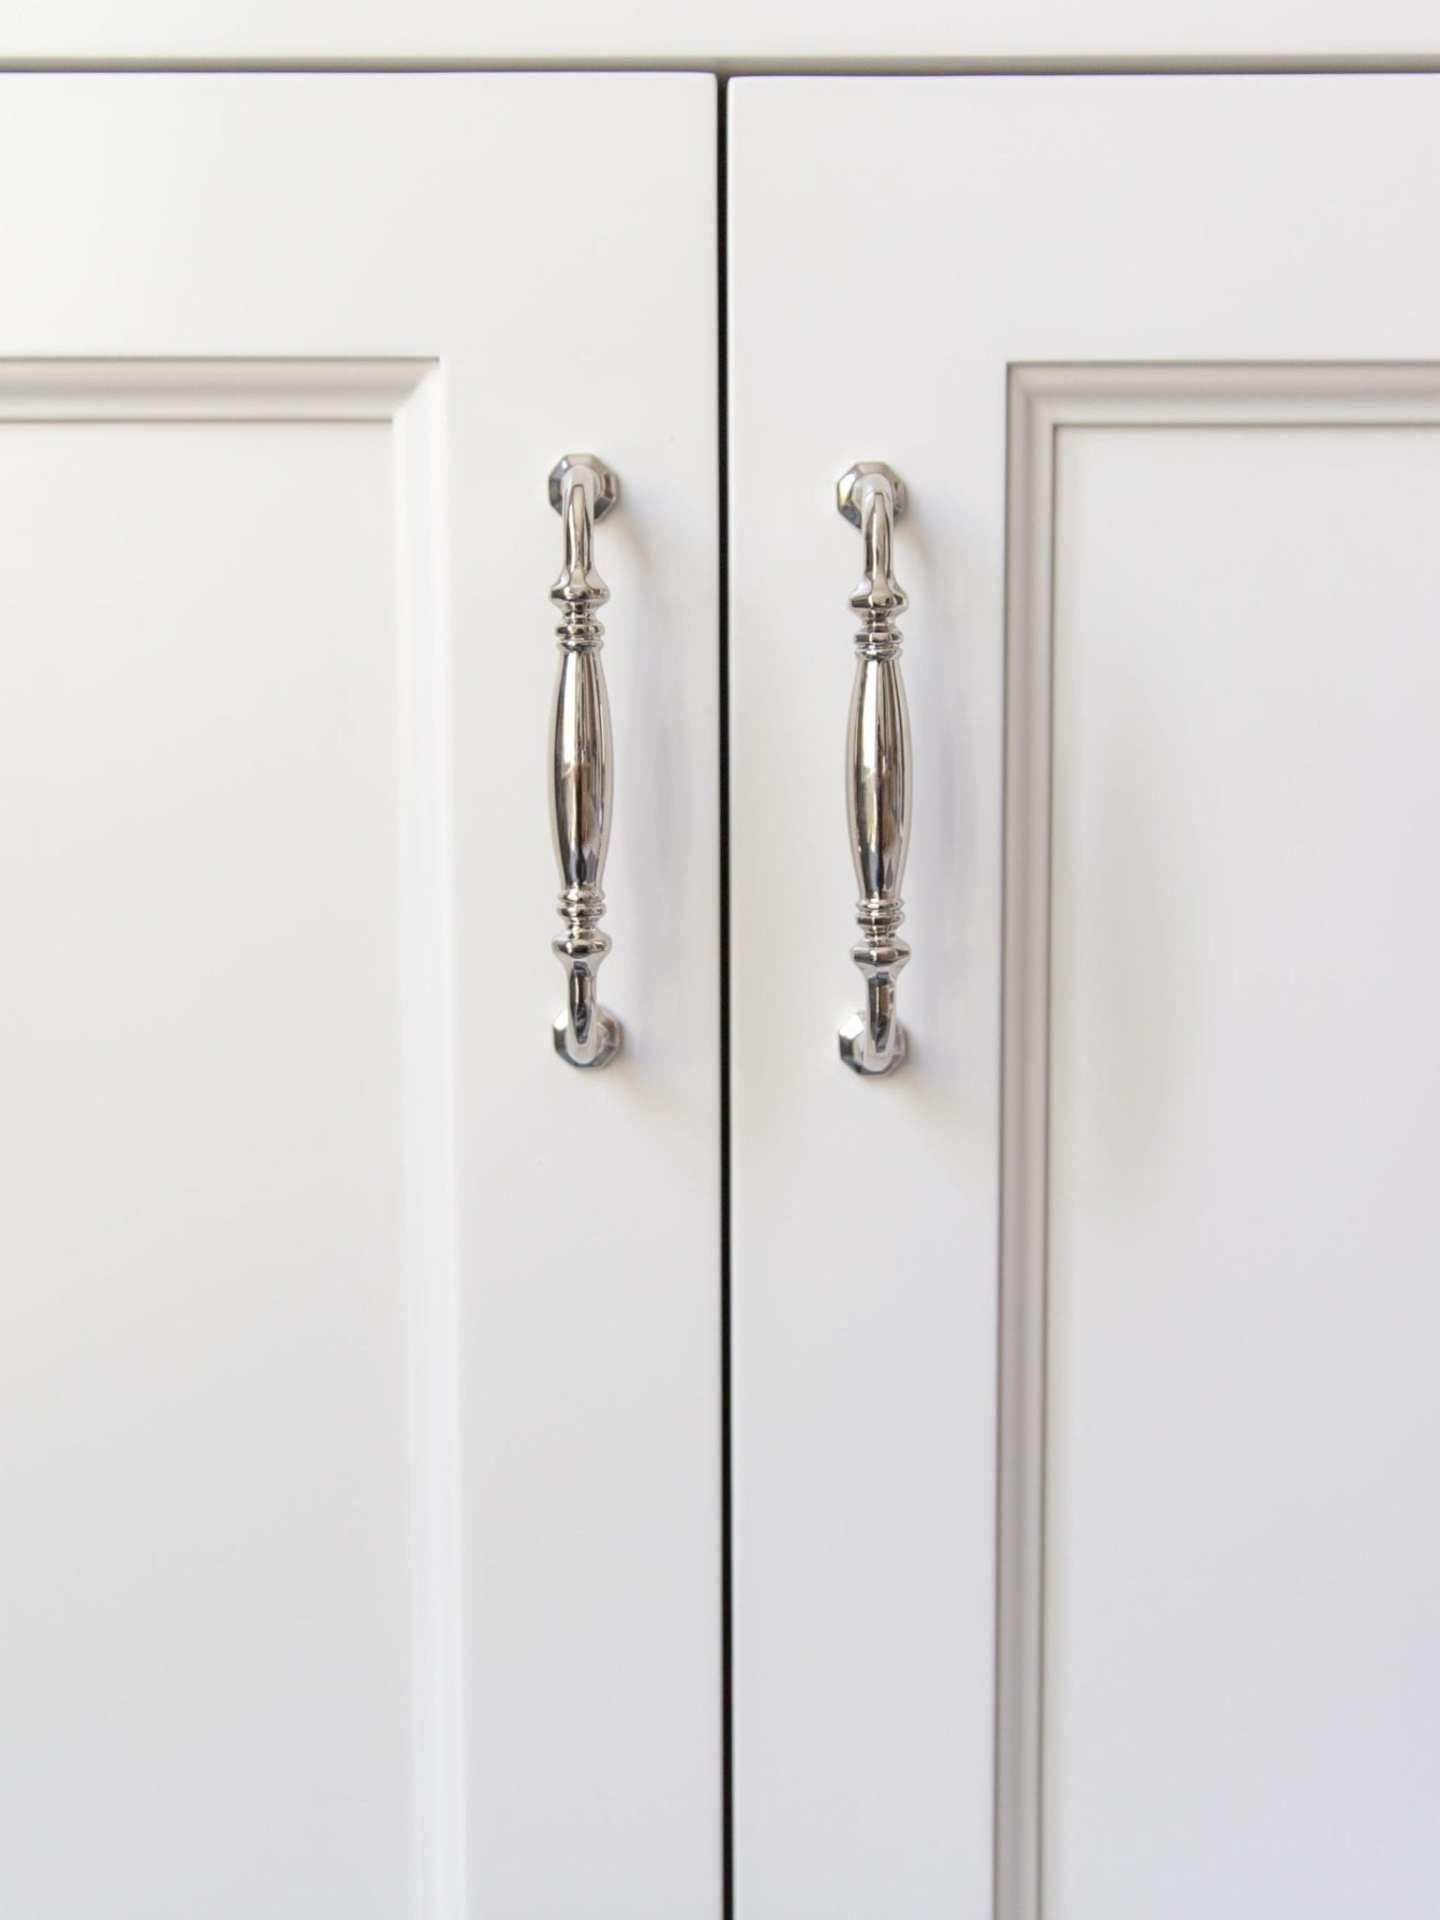 Polished Nickel Hardware on white bathroom cabinets.